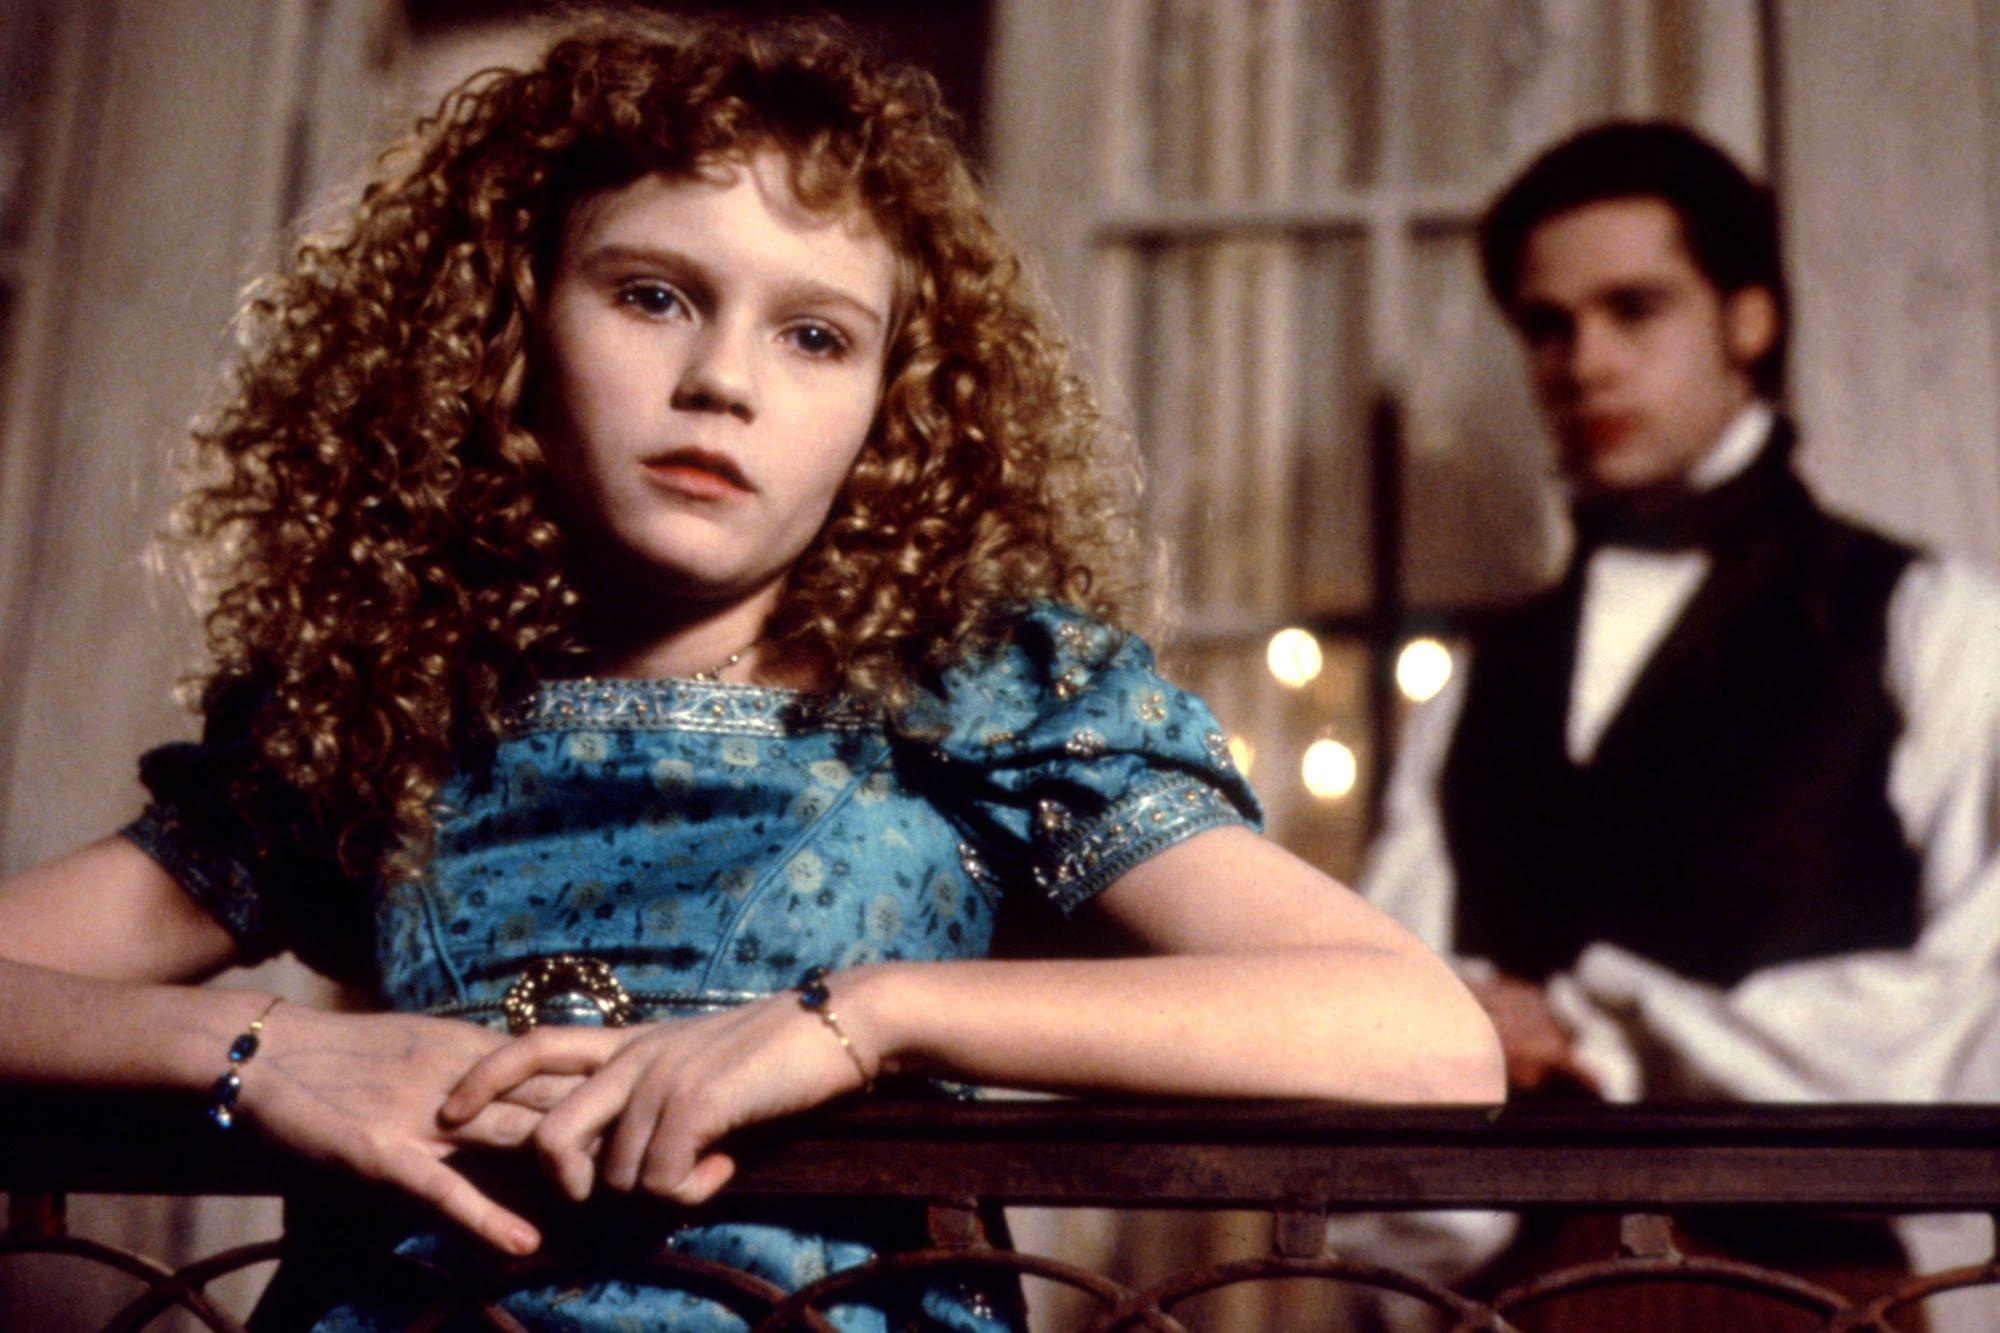 INTERVIEW WITH THE VAMPIRE, Kirsten Dunst, Brad Pitt, 1994, (c)Warner Bros./courtesy Everett Collect